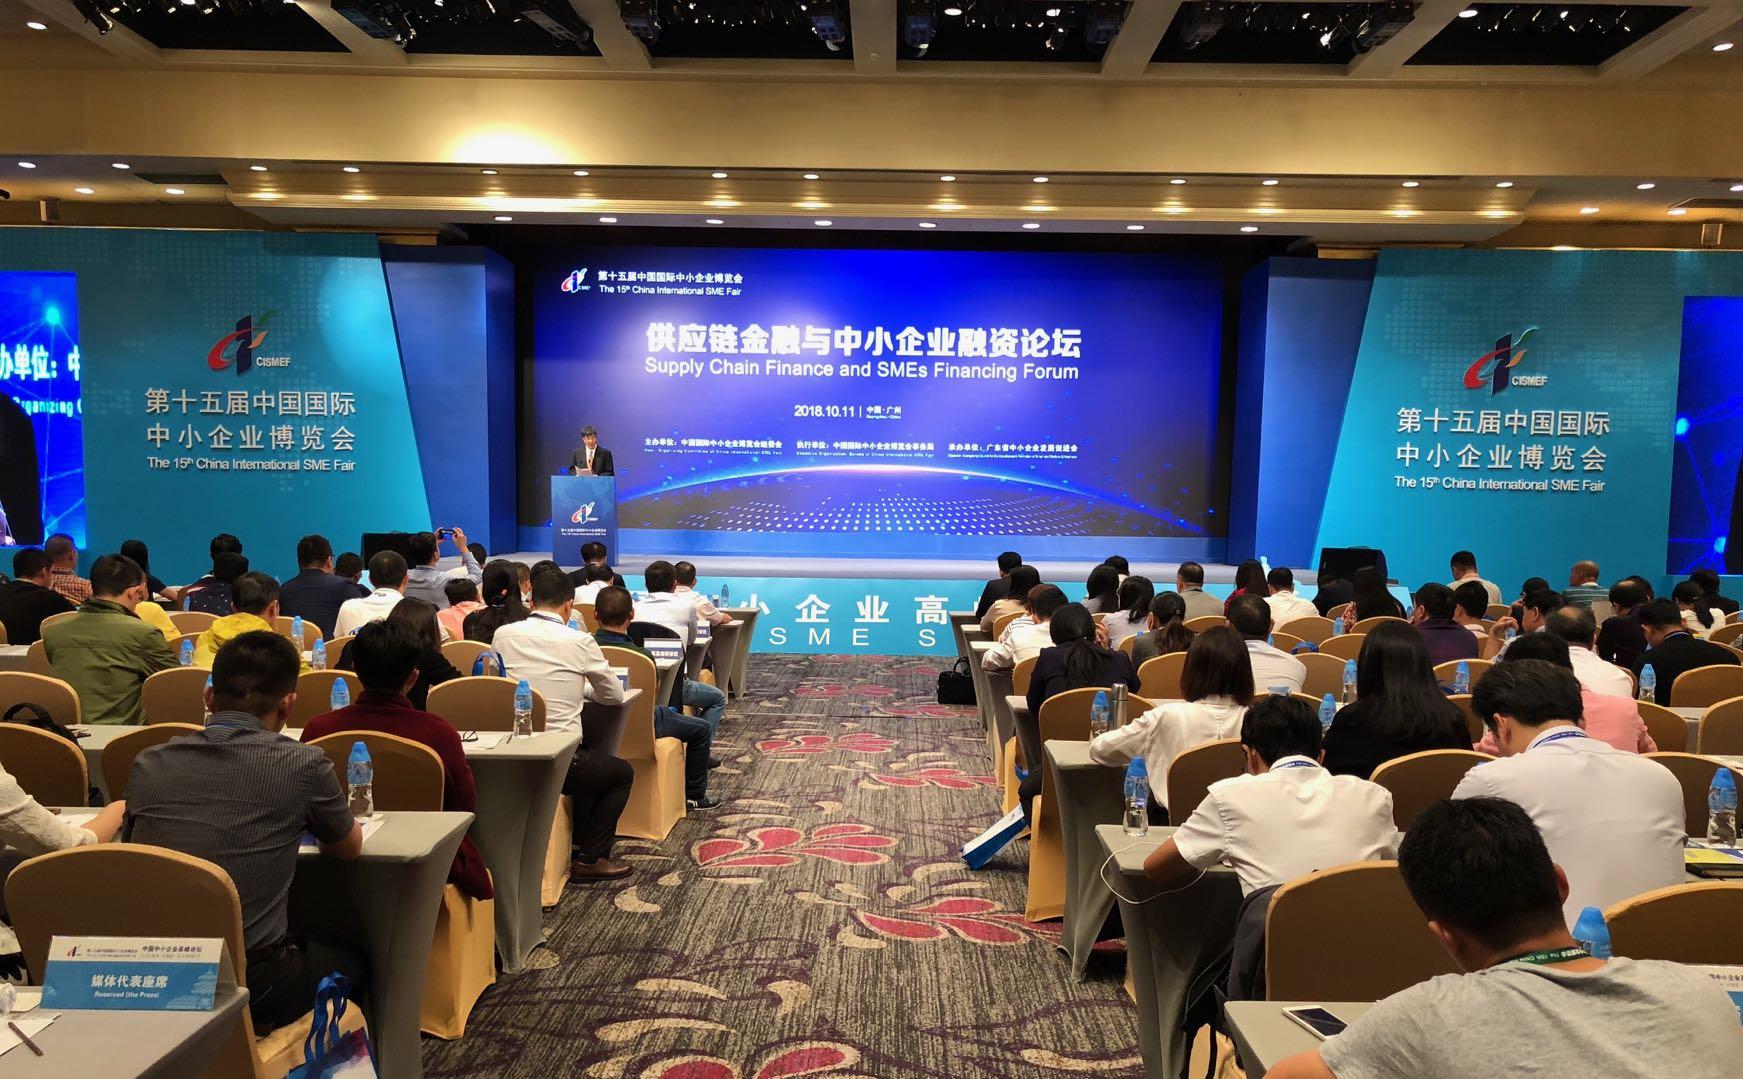 Economic Watch: Entrepreneurs reassured after Xi vows unwavering support